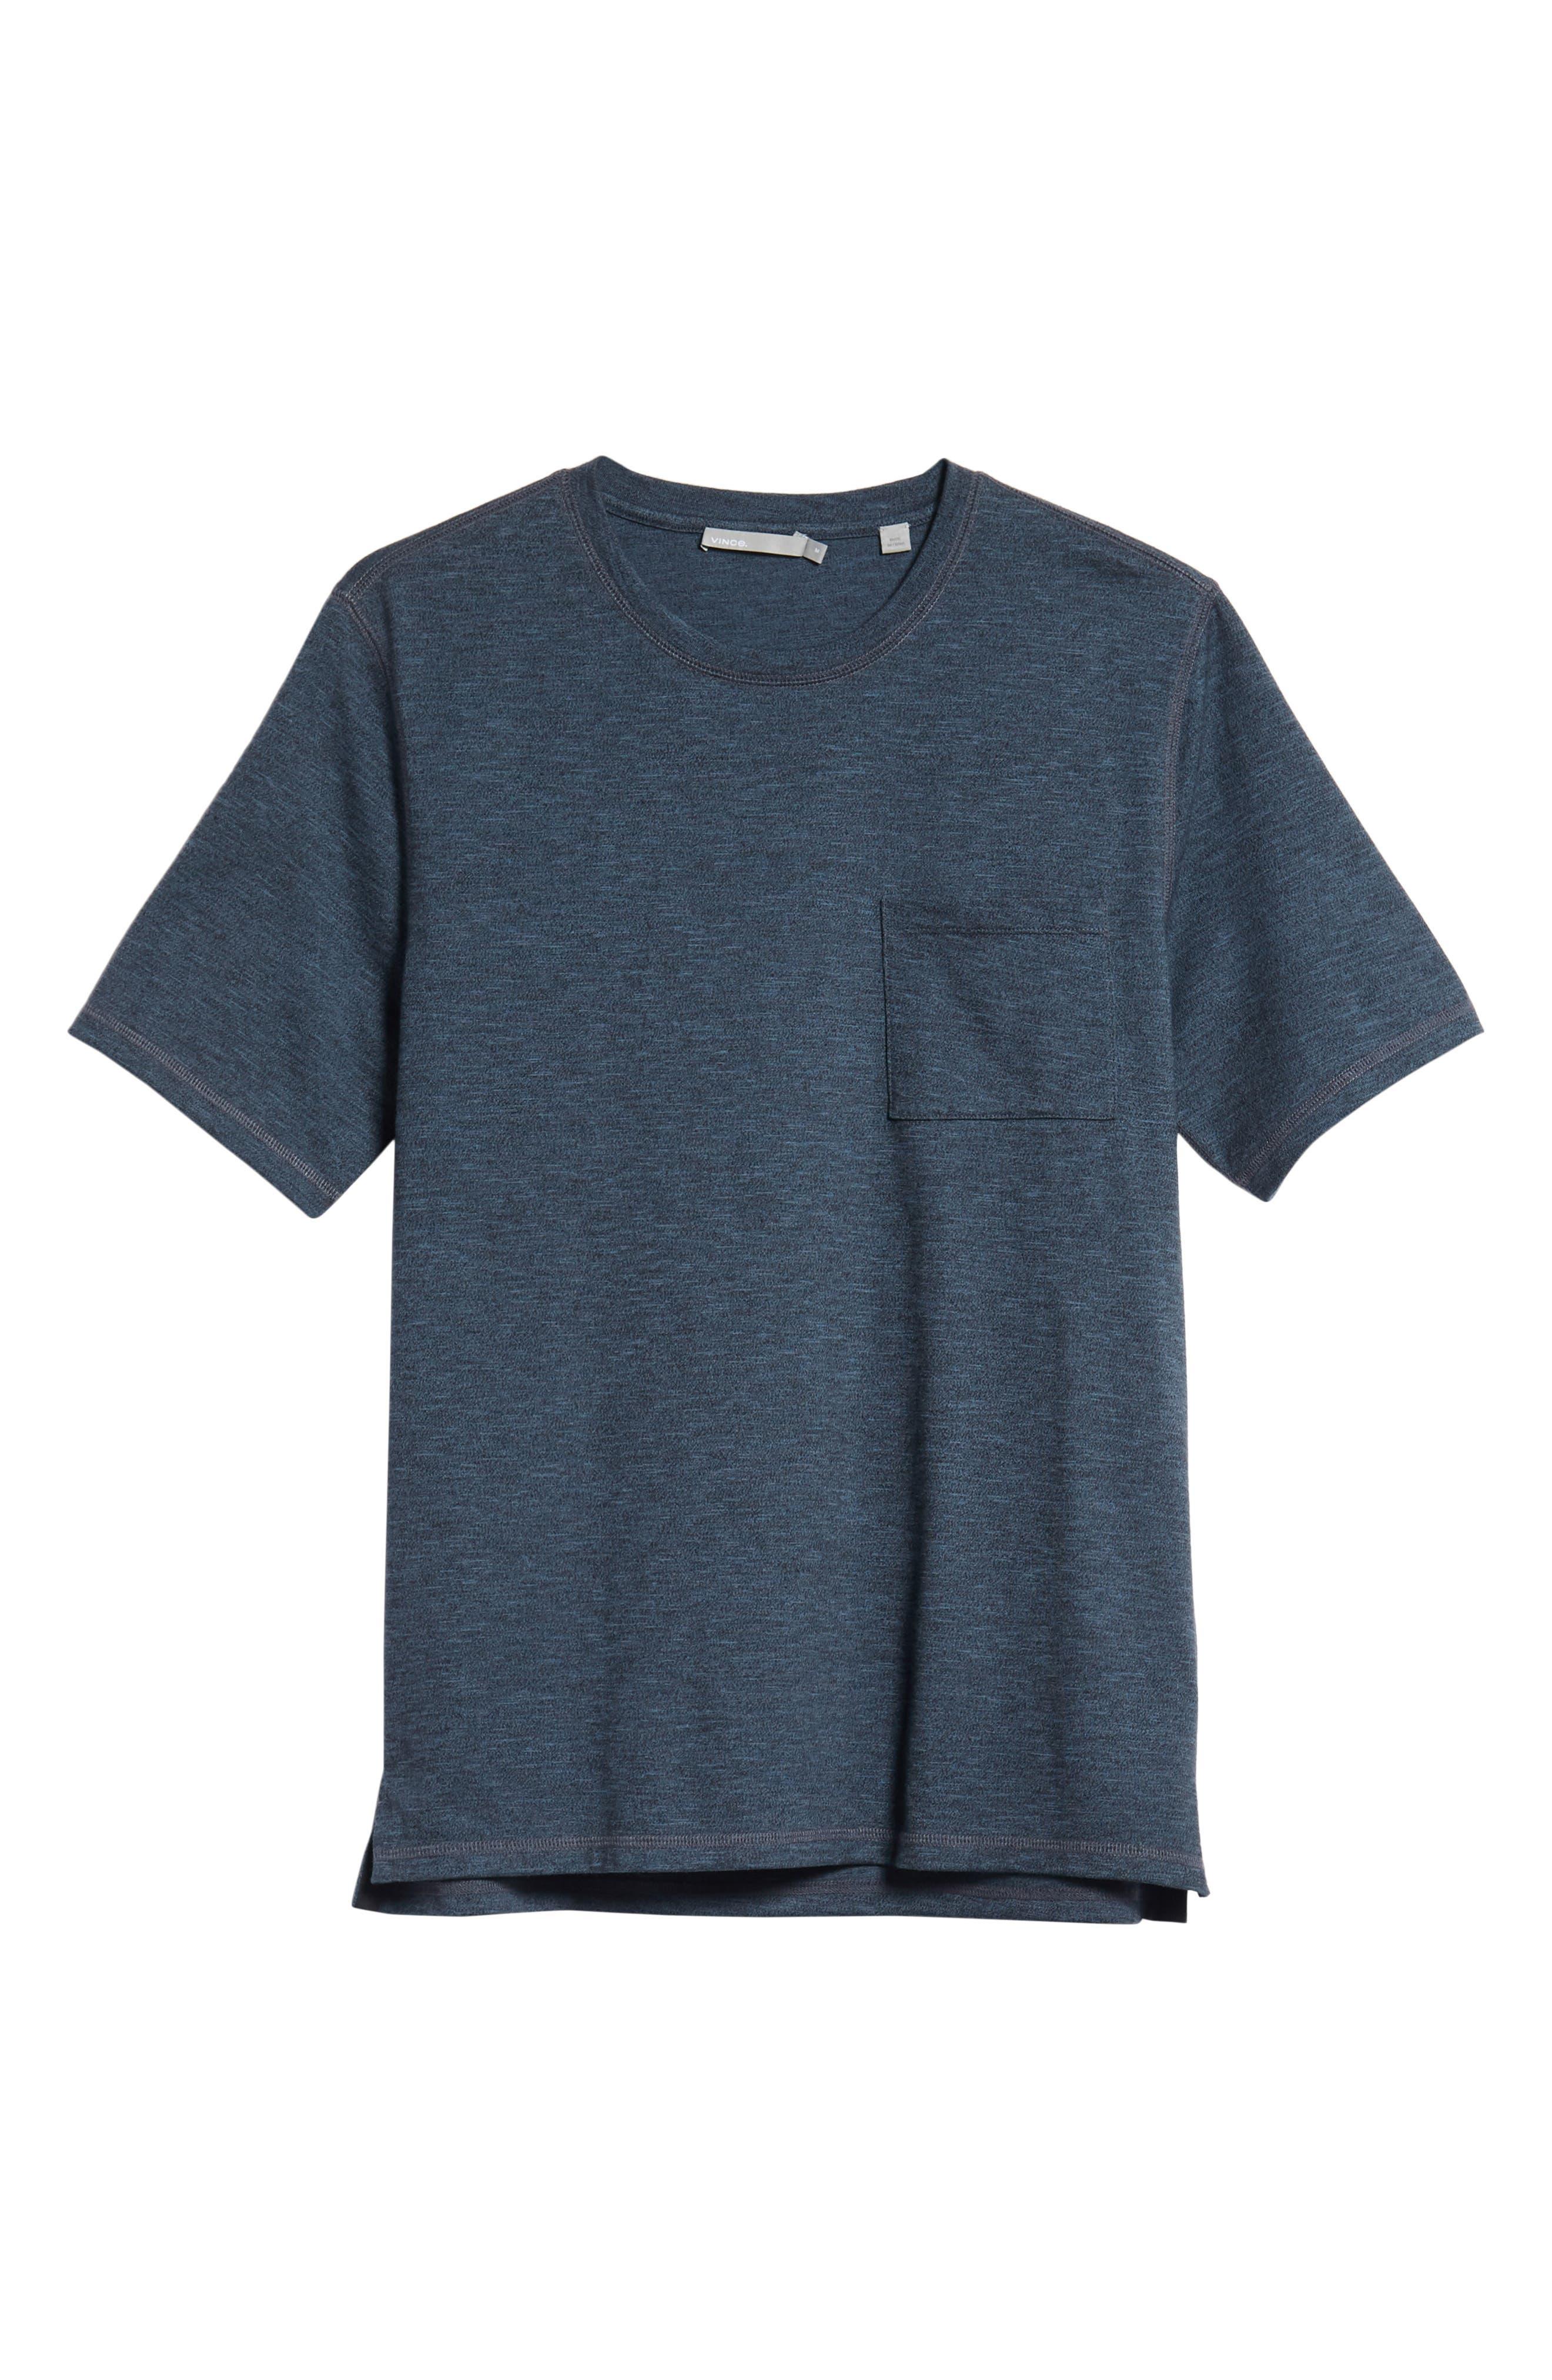 Classic Fit Pocket T-Shirt,                             Alternate thumbnail 6, color,                             400